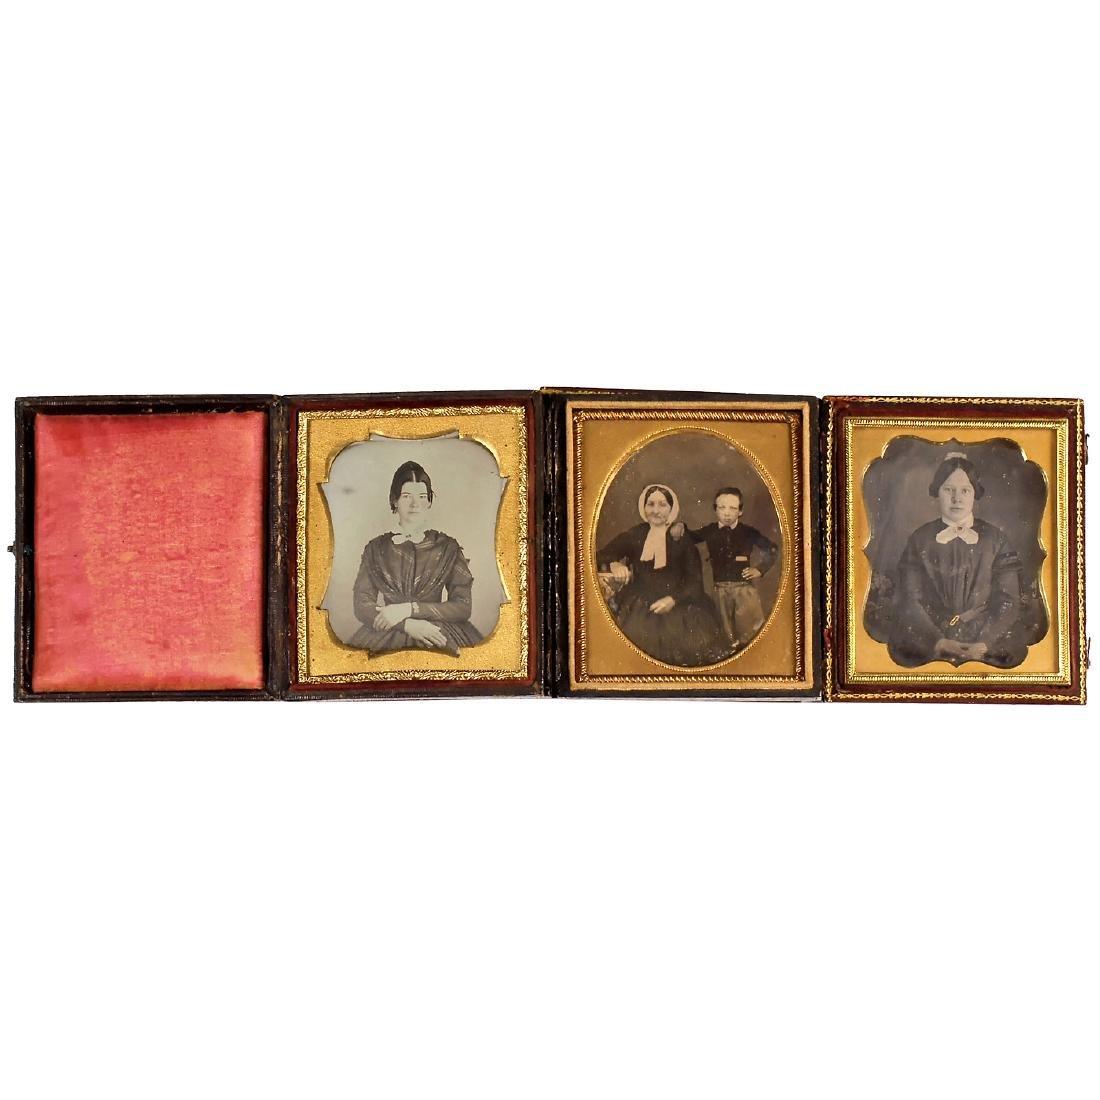 3 Daguerreotypes (1/8 Plates), c. 1845-50 - 2